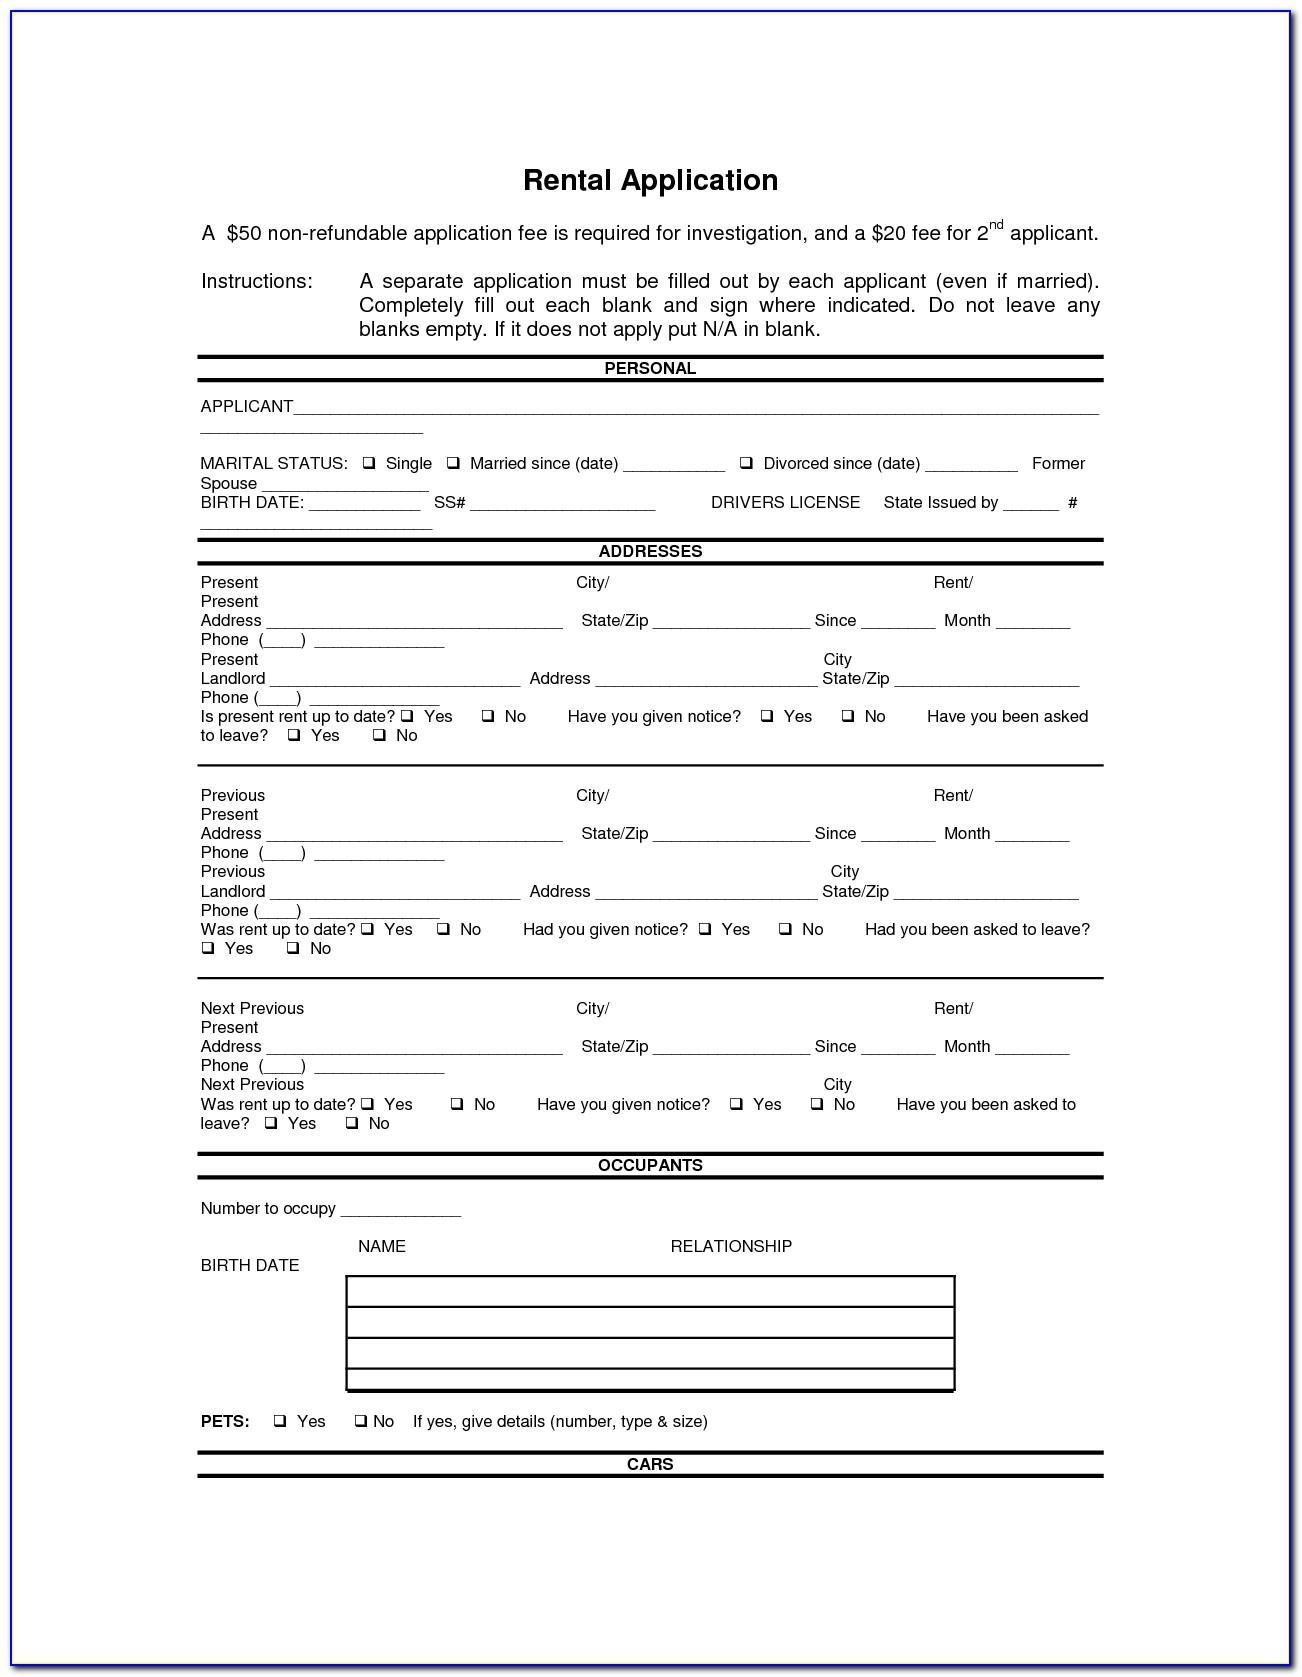 Doc.#592799: Printable Rental Agreement Forms – Free Rental Forms - Free Printable Rental Application Form